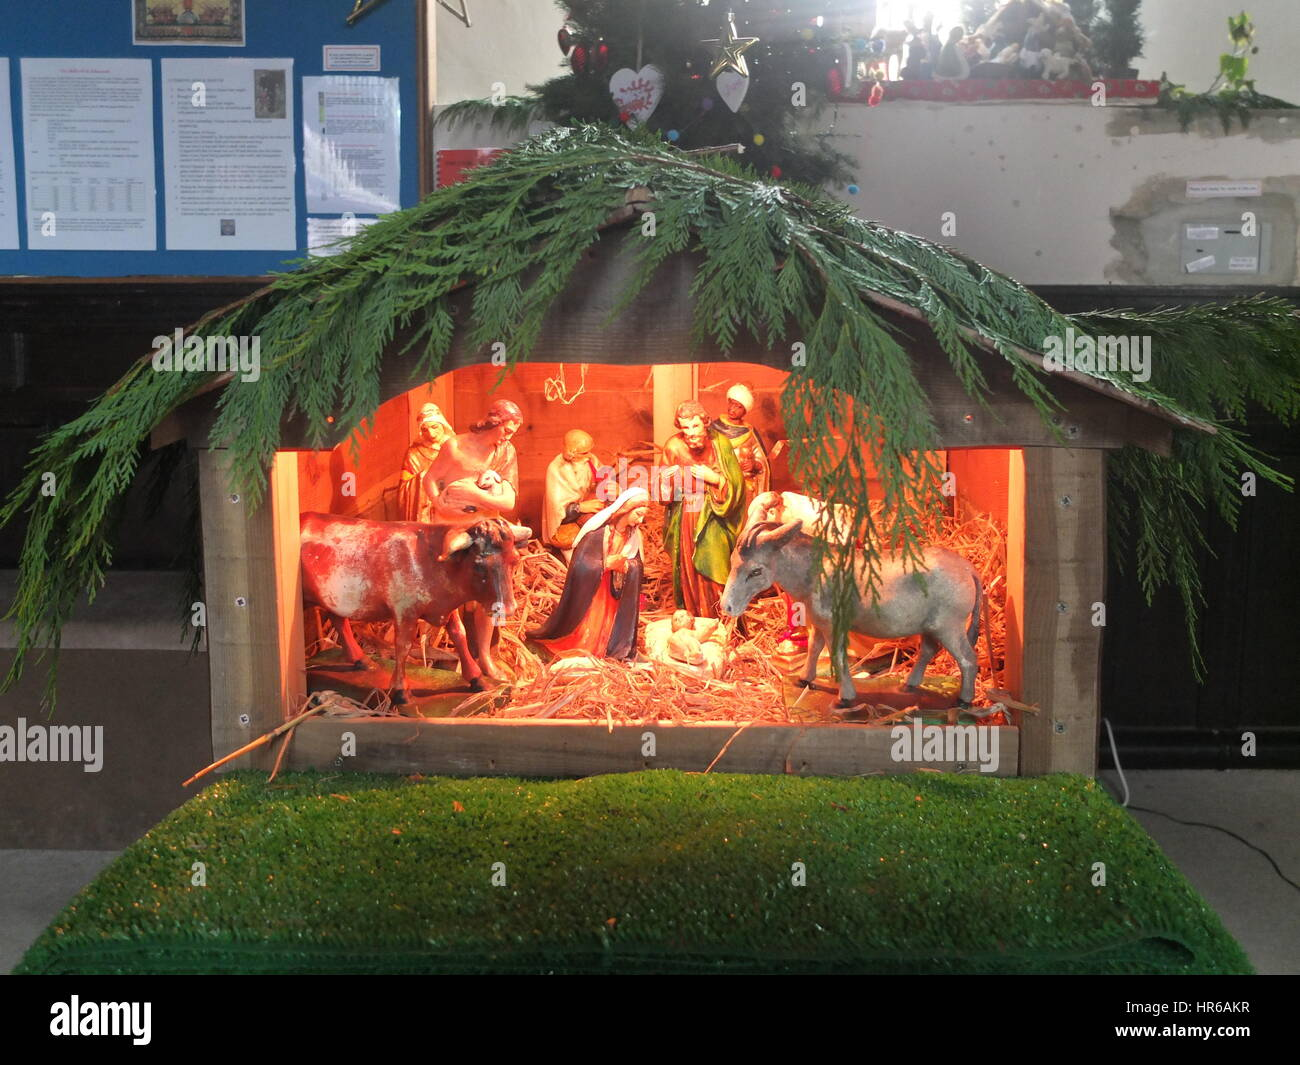 An illuminated model nativity scene draped with evergreens in a church at Christmas (St. Edmund's Church, Castleton, Stock Photo